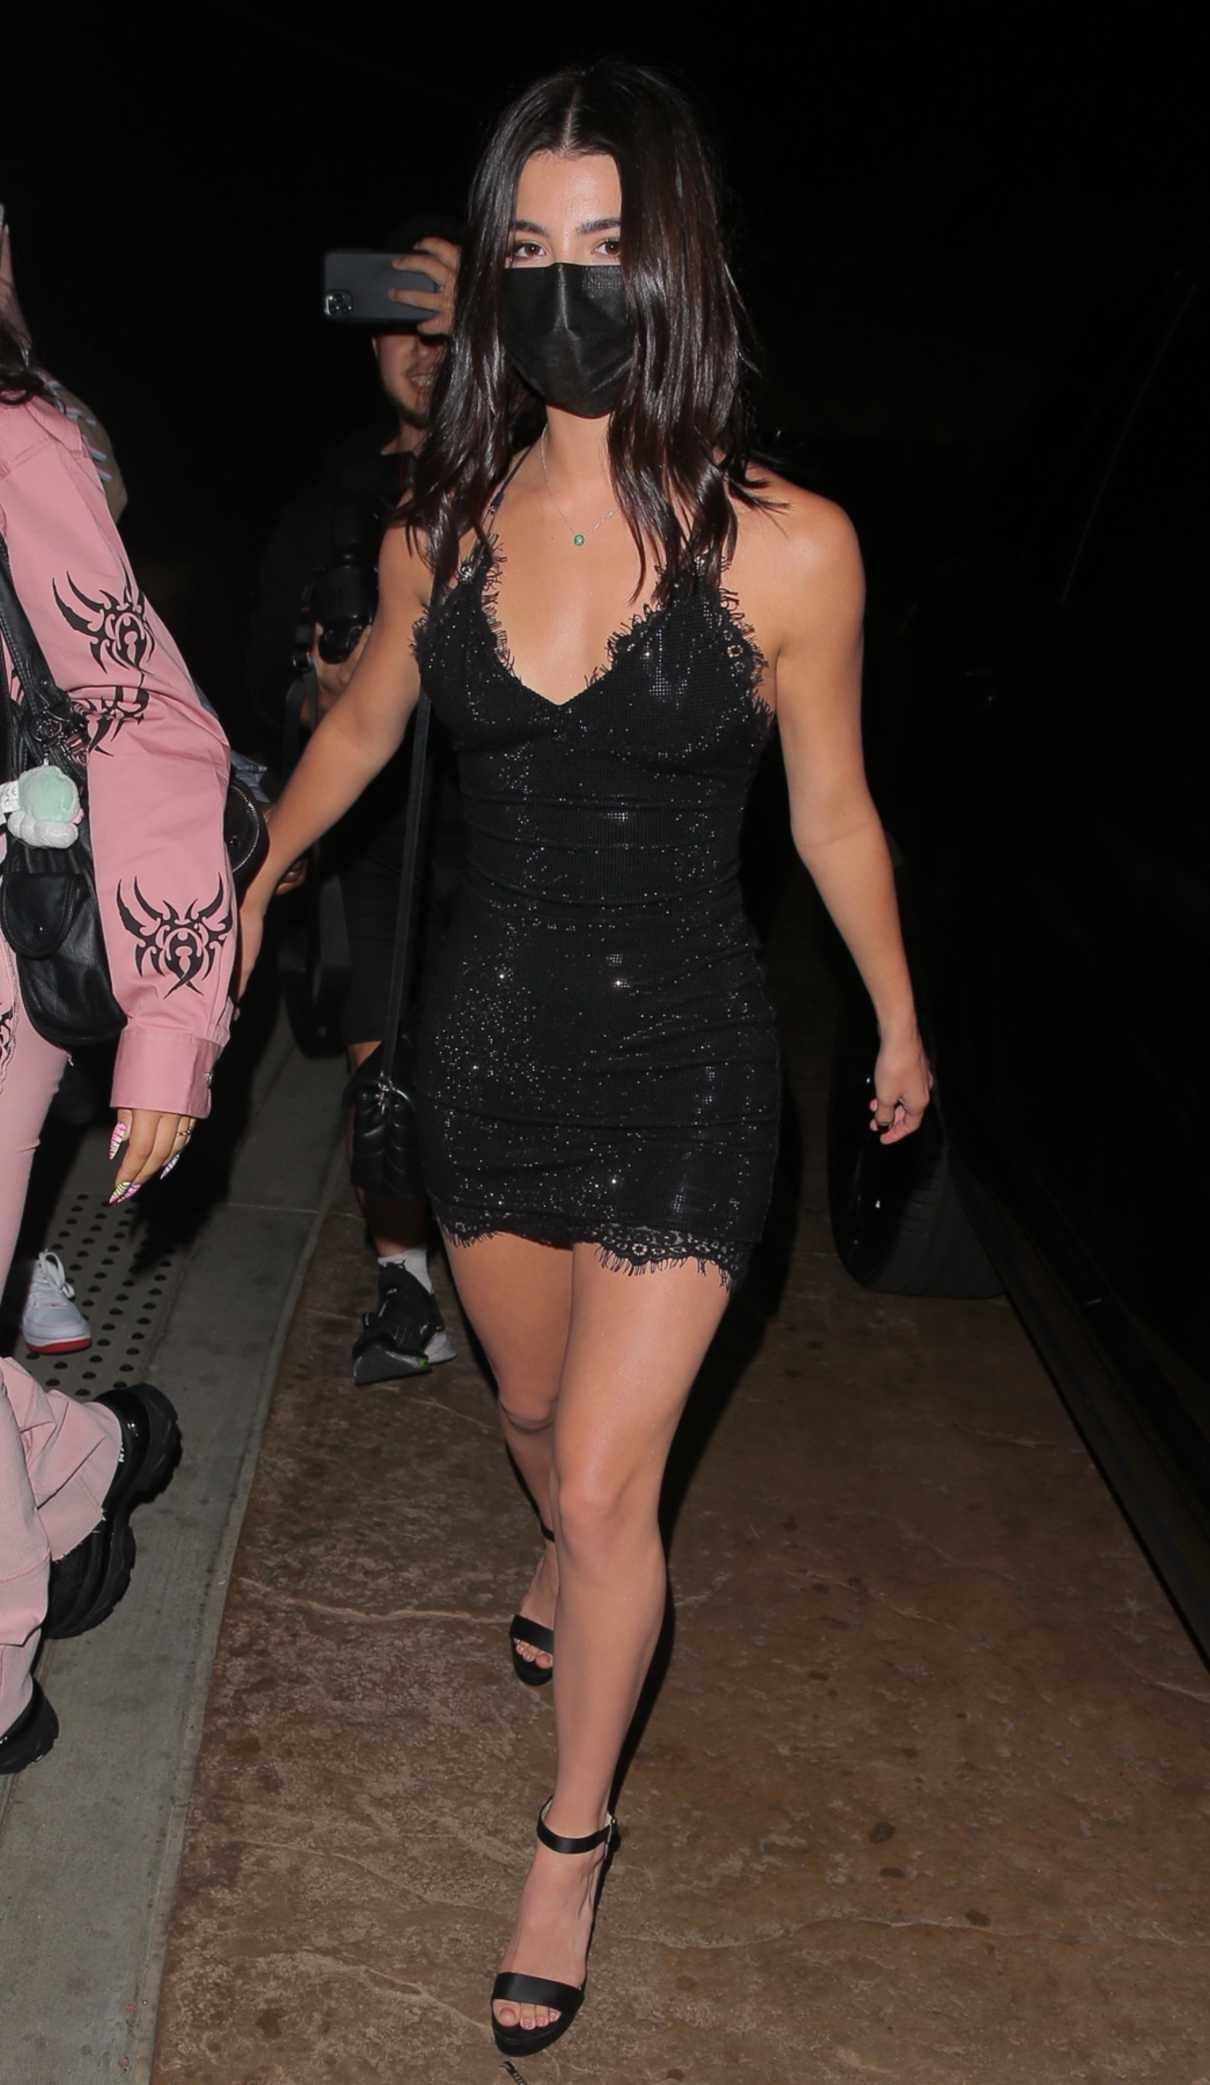 Charli D'amelio in a Black Mini Dress